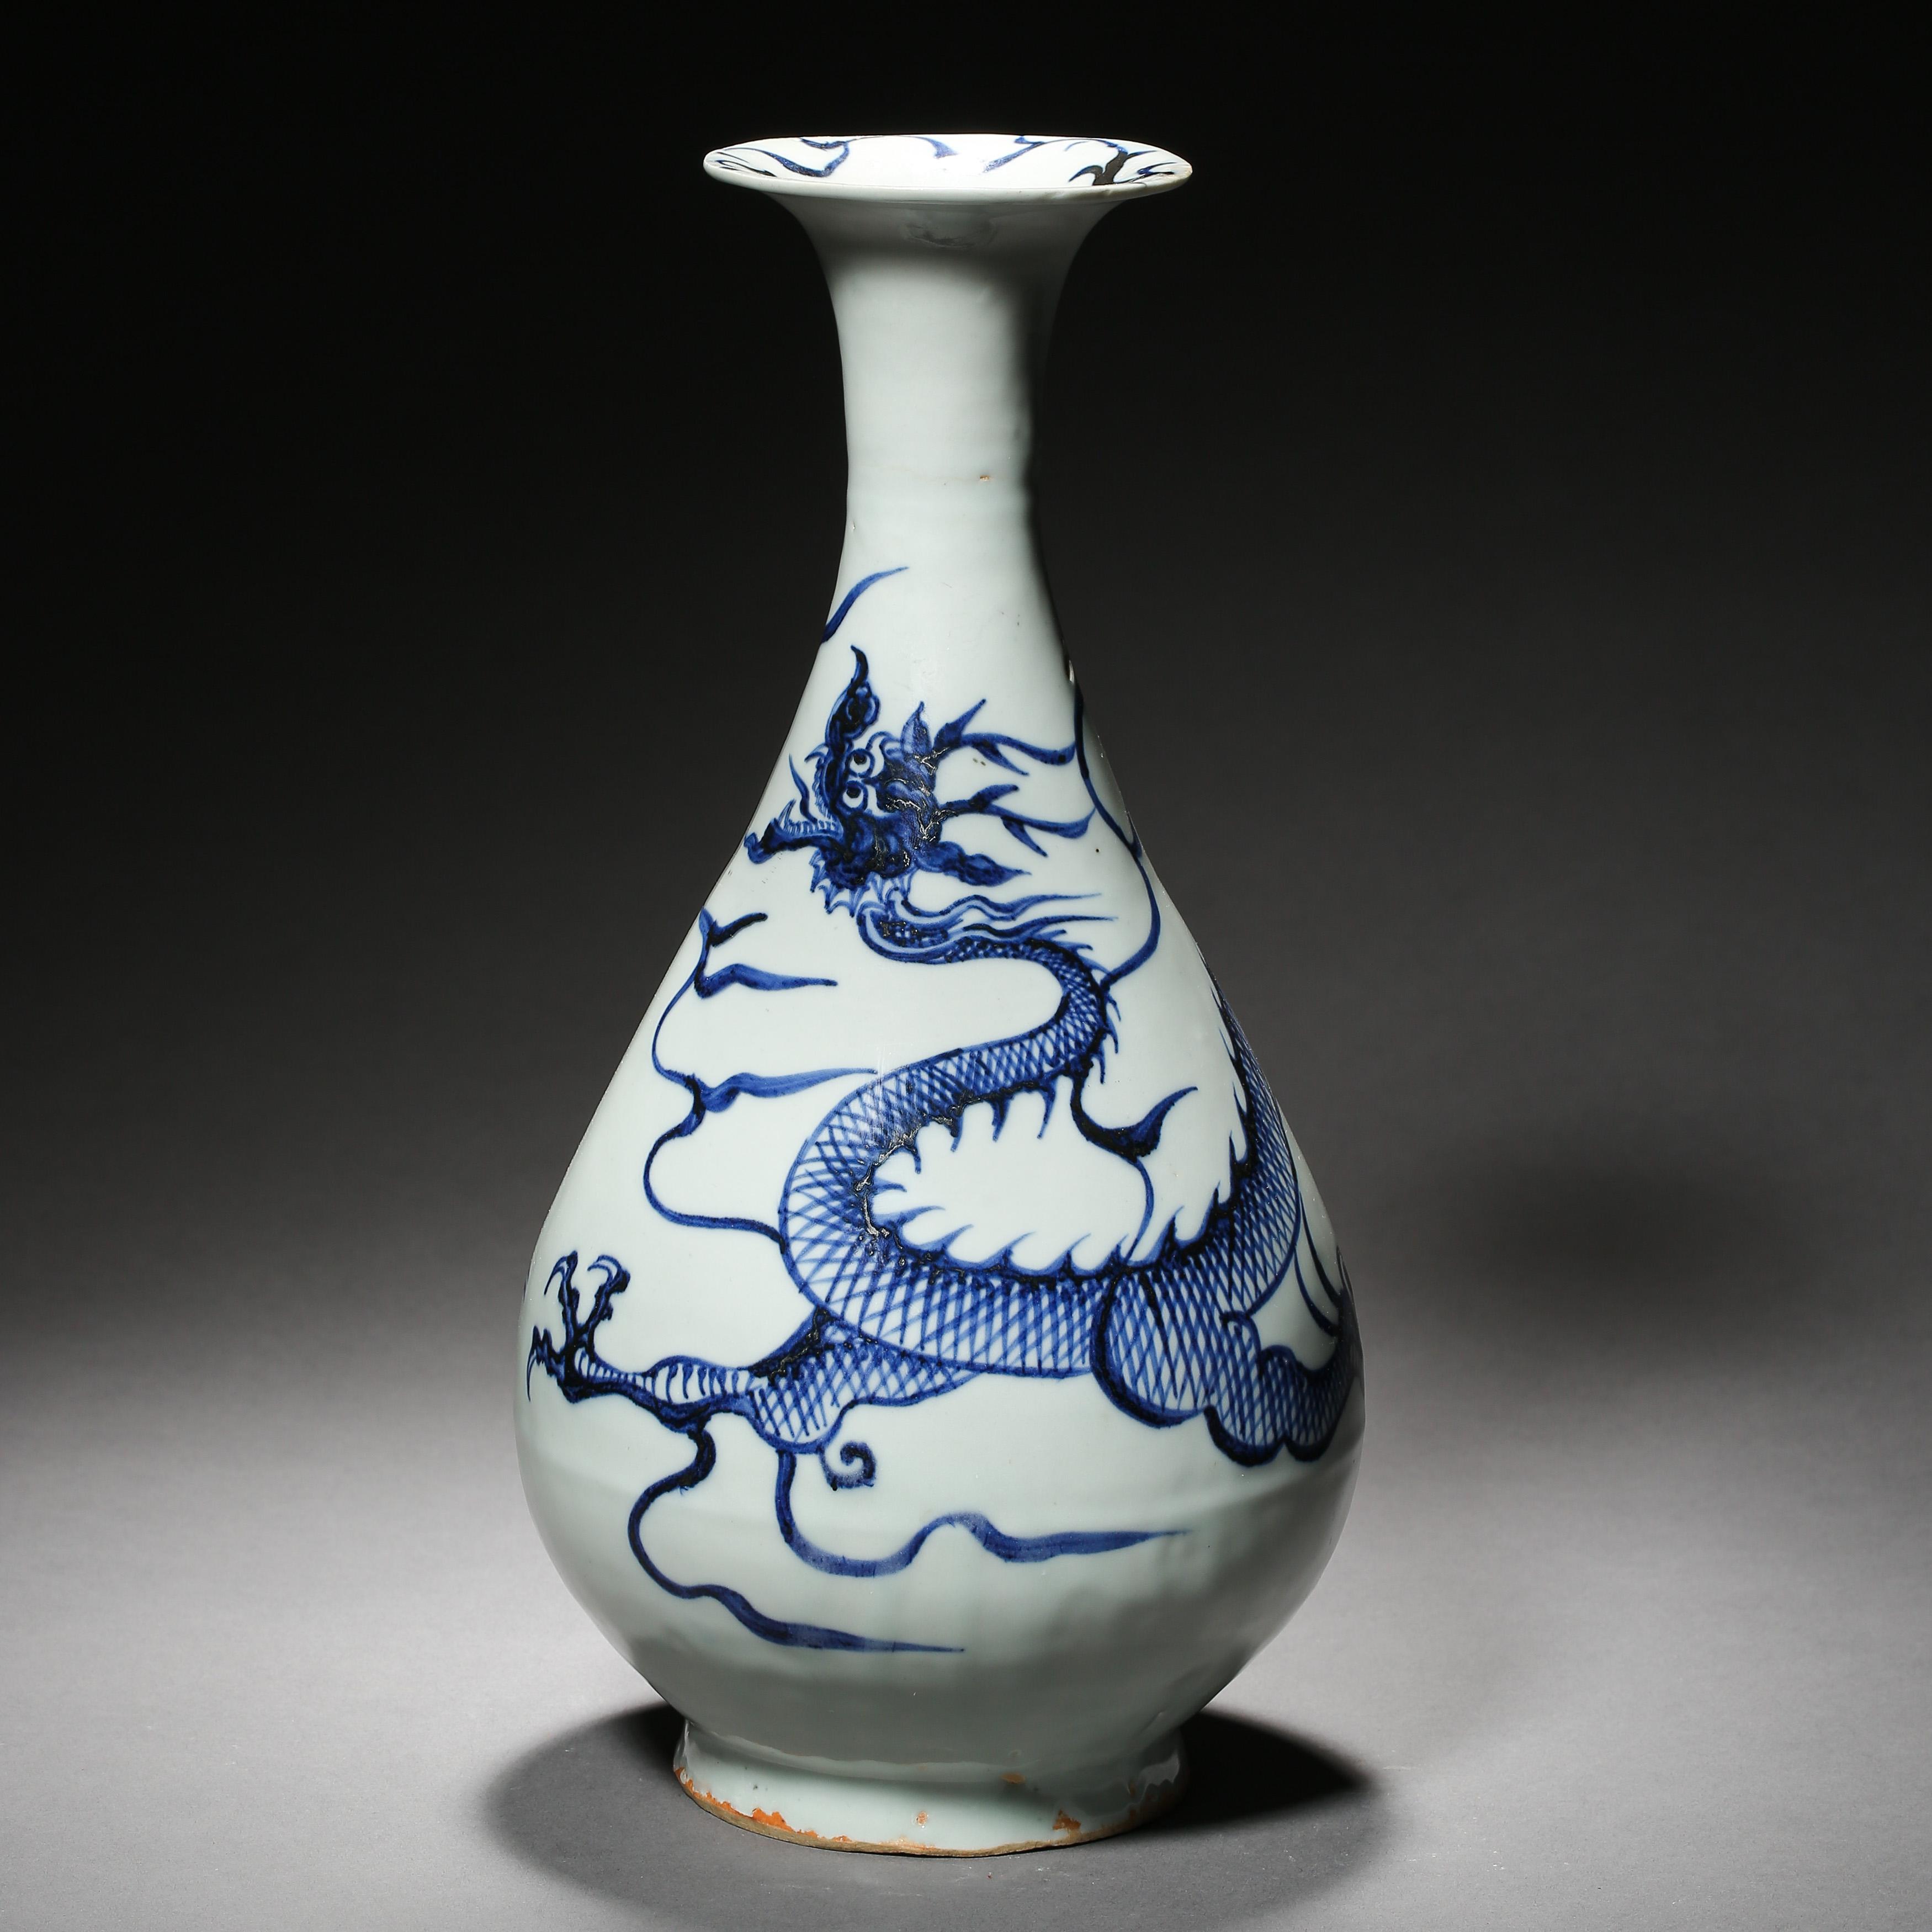 BLUE AND WHITE DRAGON PATTERN VASE, YUAN DYNASTY, CHINA